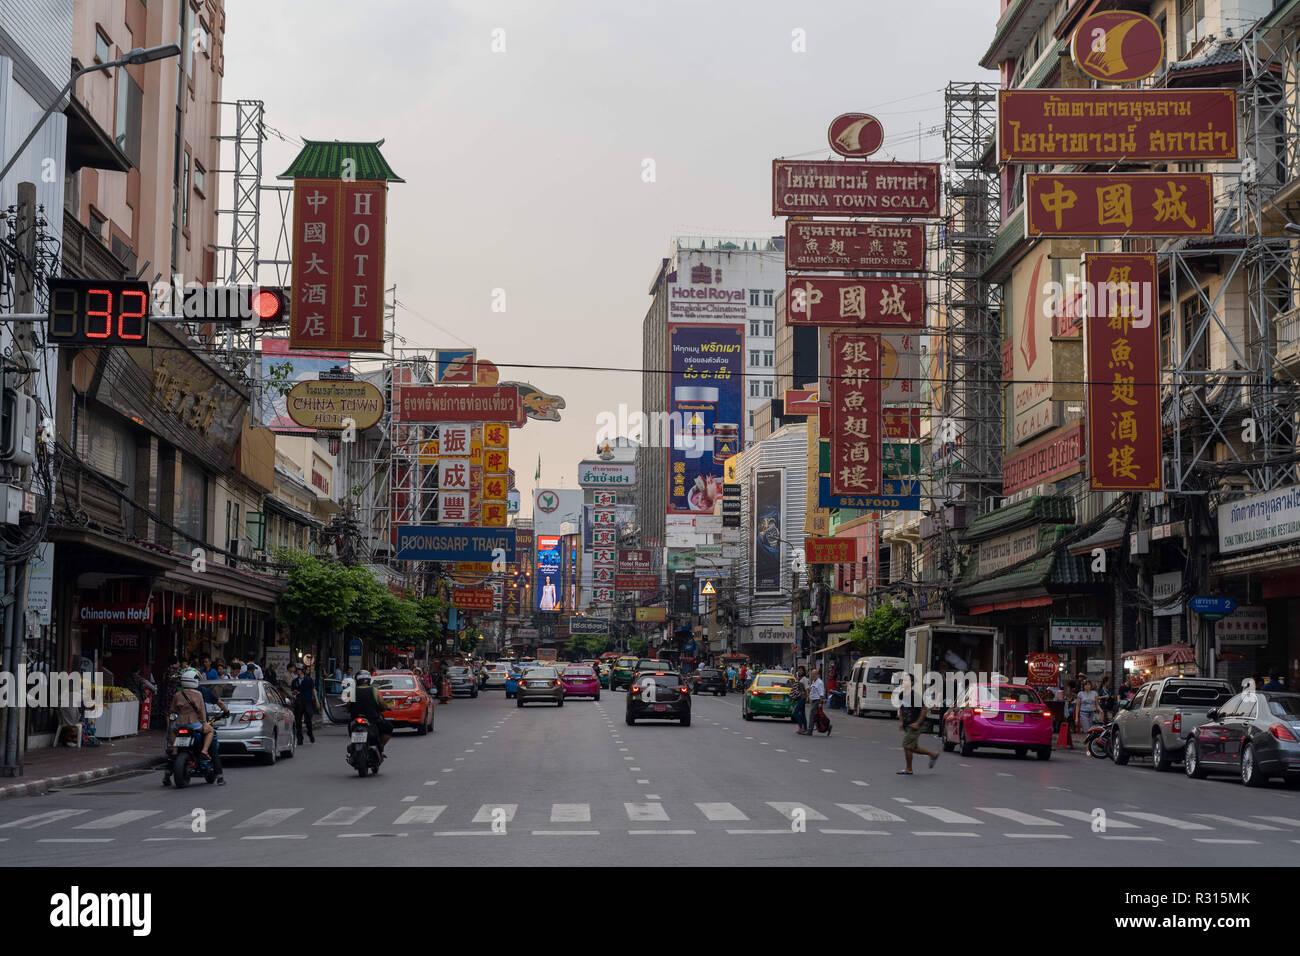 Bangkok Pathum Thani Thailand 19th Nov 2018 Street View Of